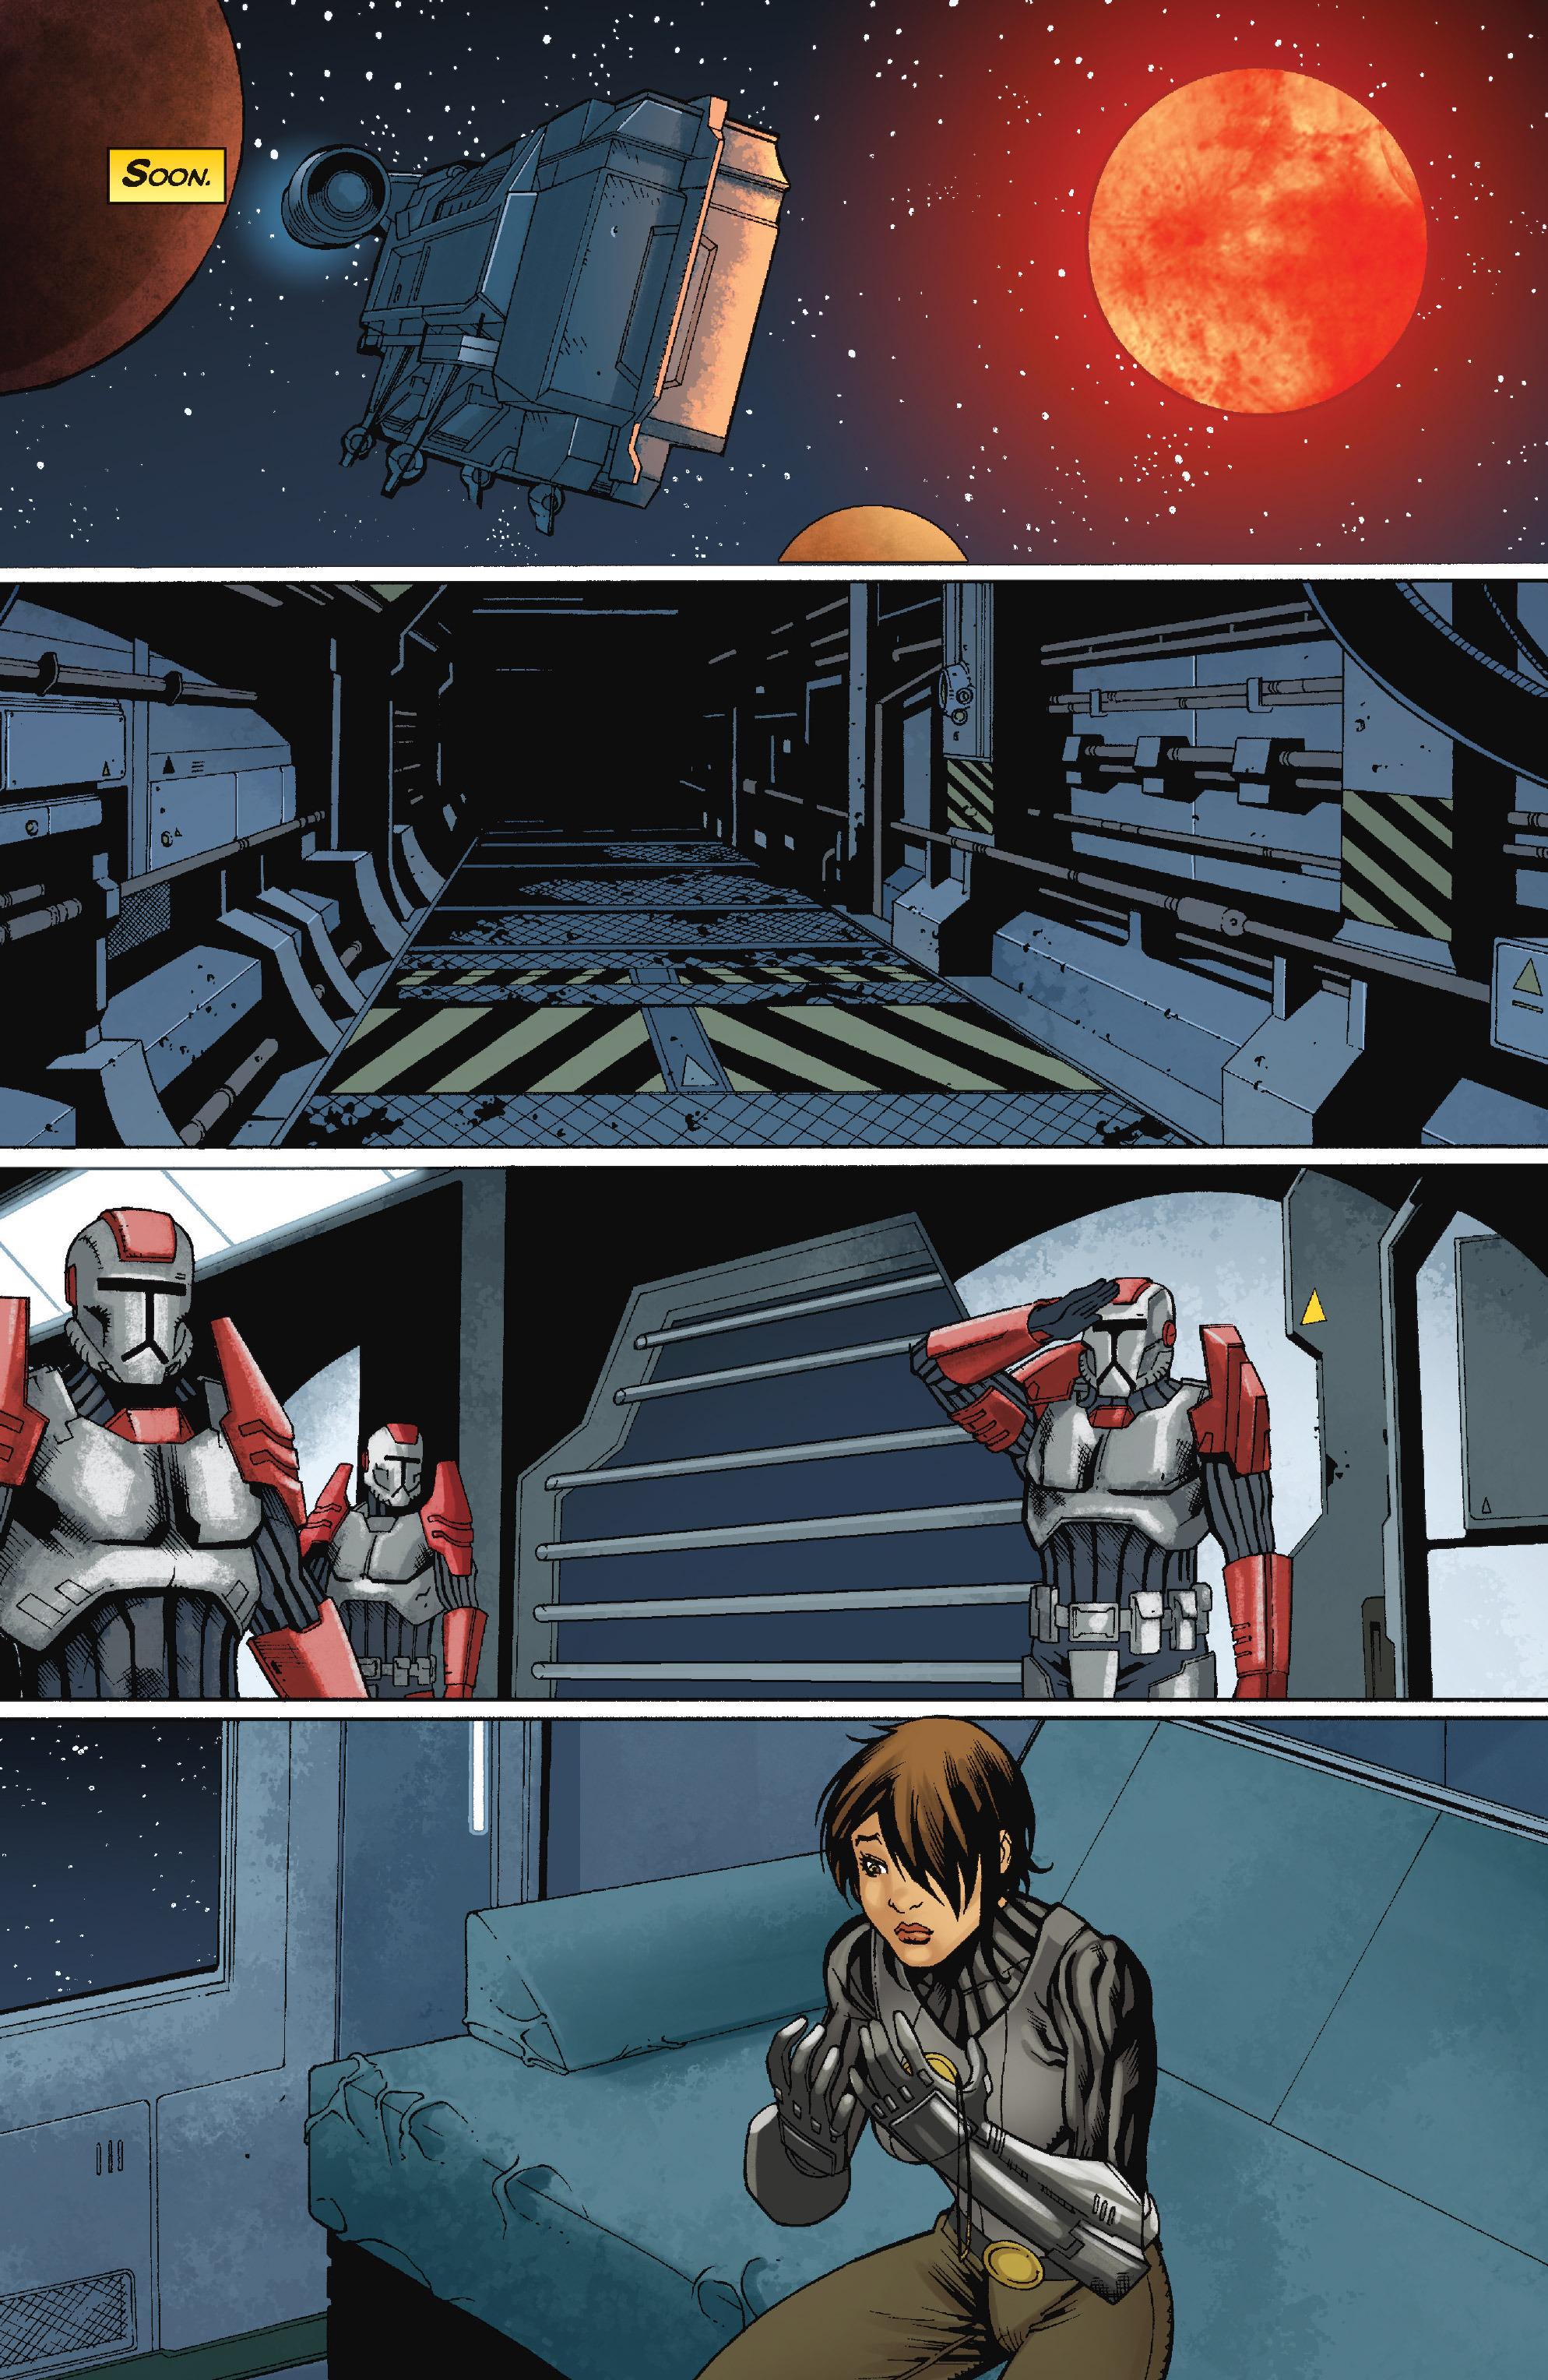 Read online Star Wars: Knight Errant - Escape comic -  Issue #4 - 17